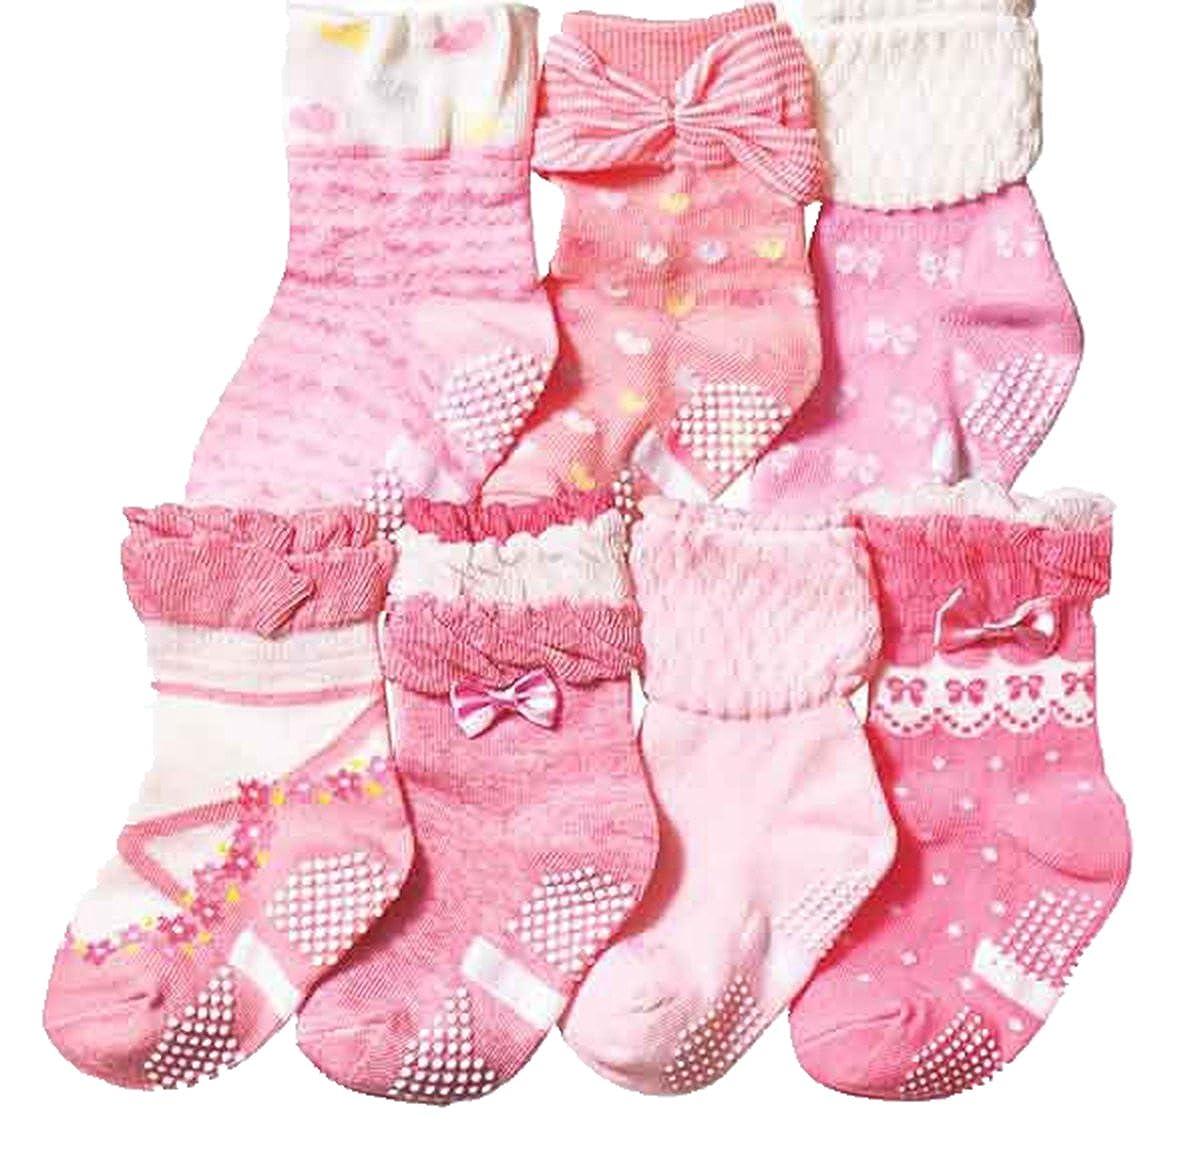 Baby Girls Short Non-Slip Socks Pink Cotton Breathable Kids Socks 7 Pair Pack Czofnjesi